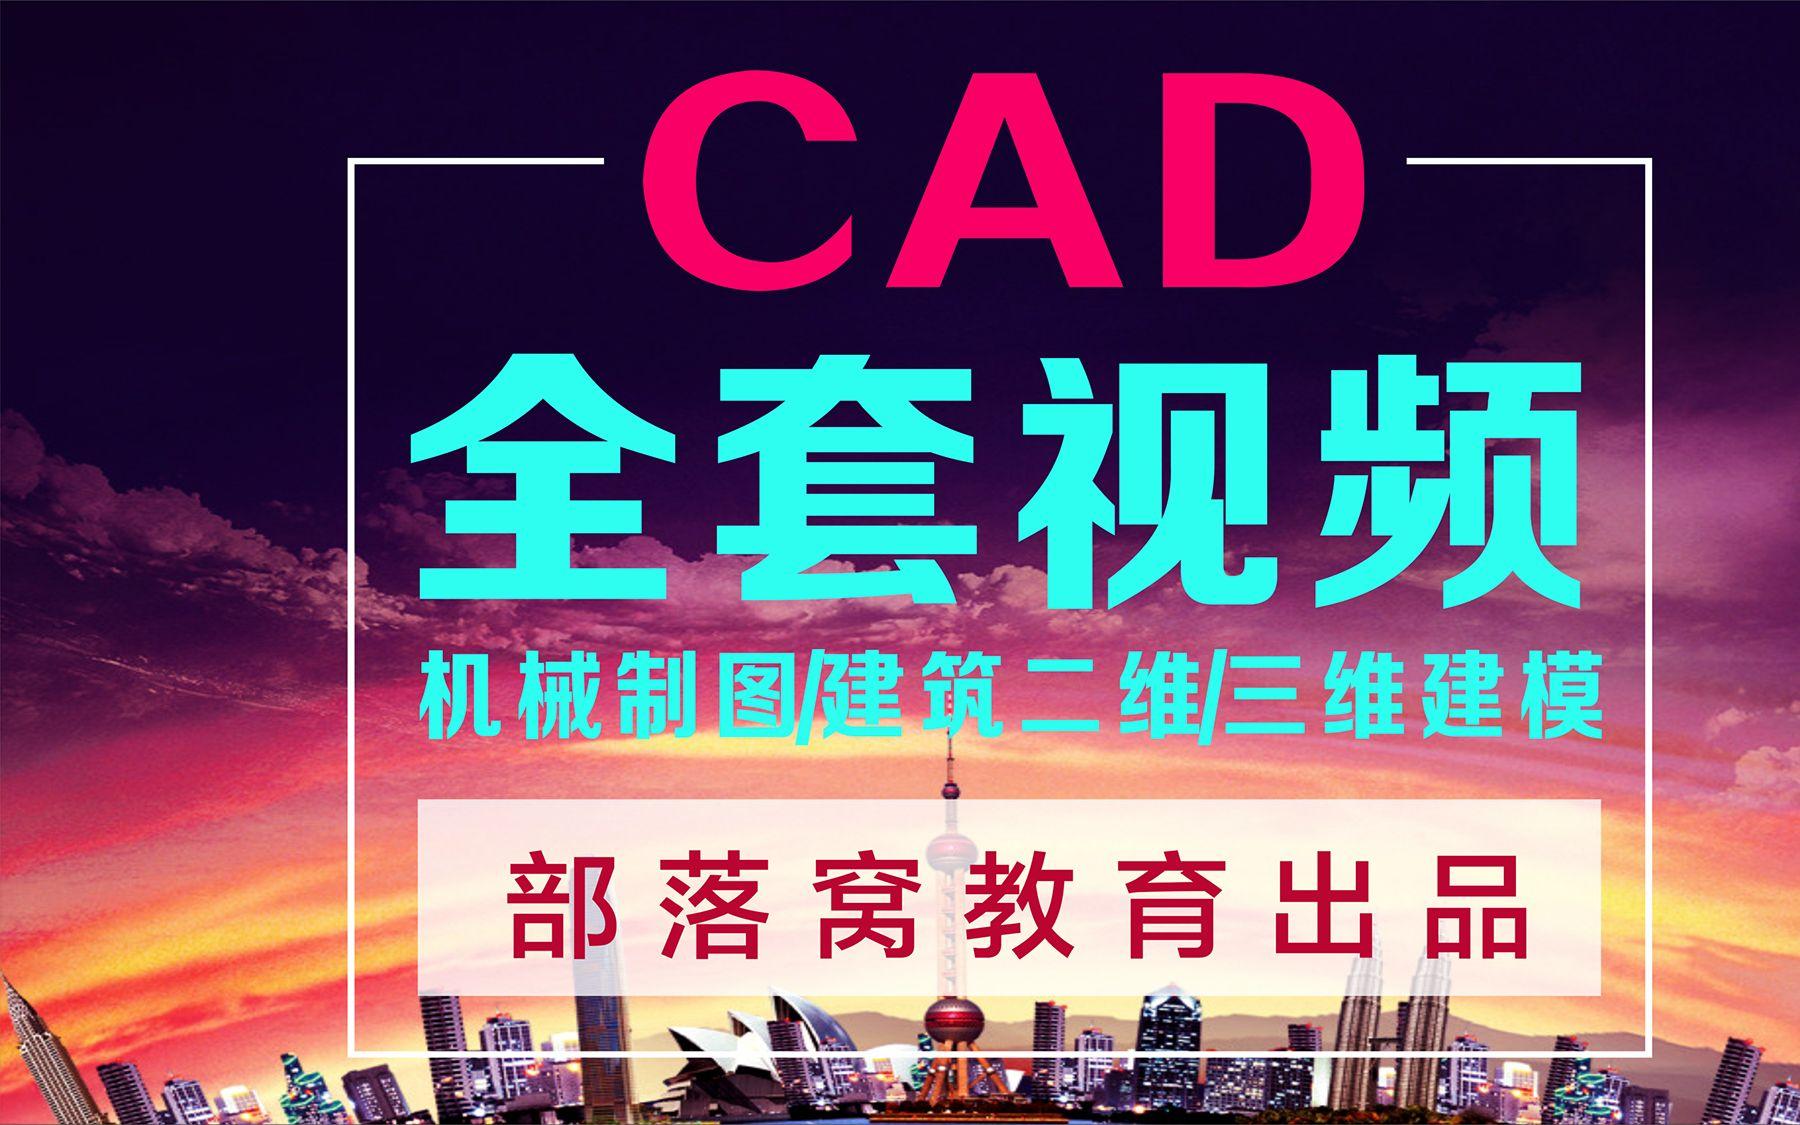 cad三维制图视频教程:cad并集差集三维制图实cad怎么调动态栏图片